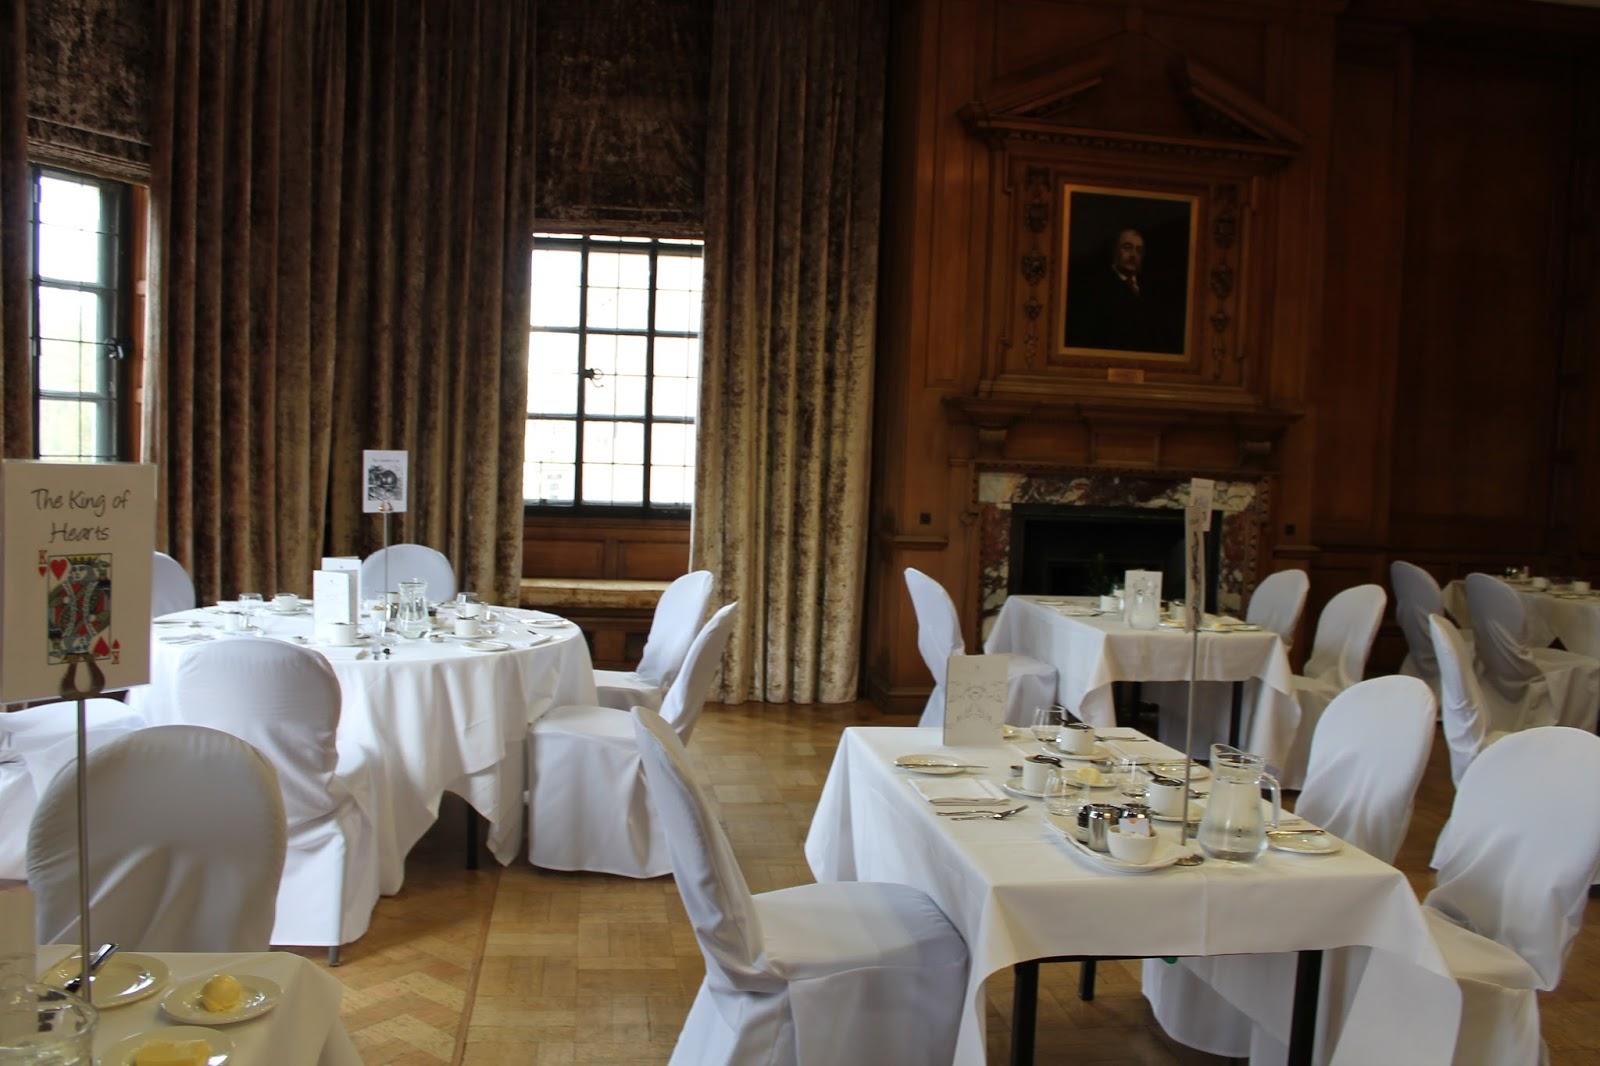 Mad Hatters Afternoon Tea - Cedar Court Grand Hotel, York